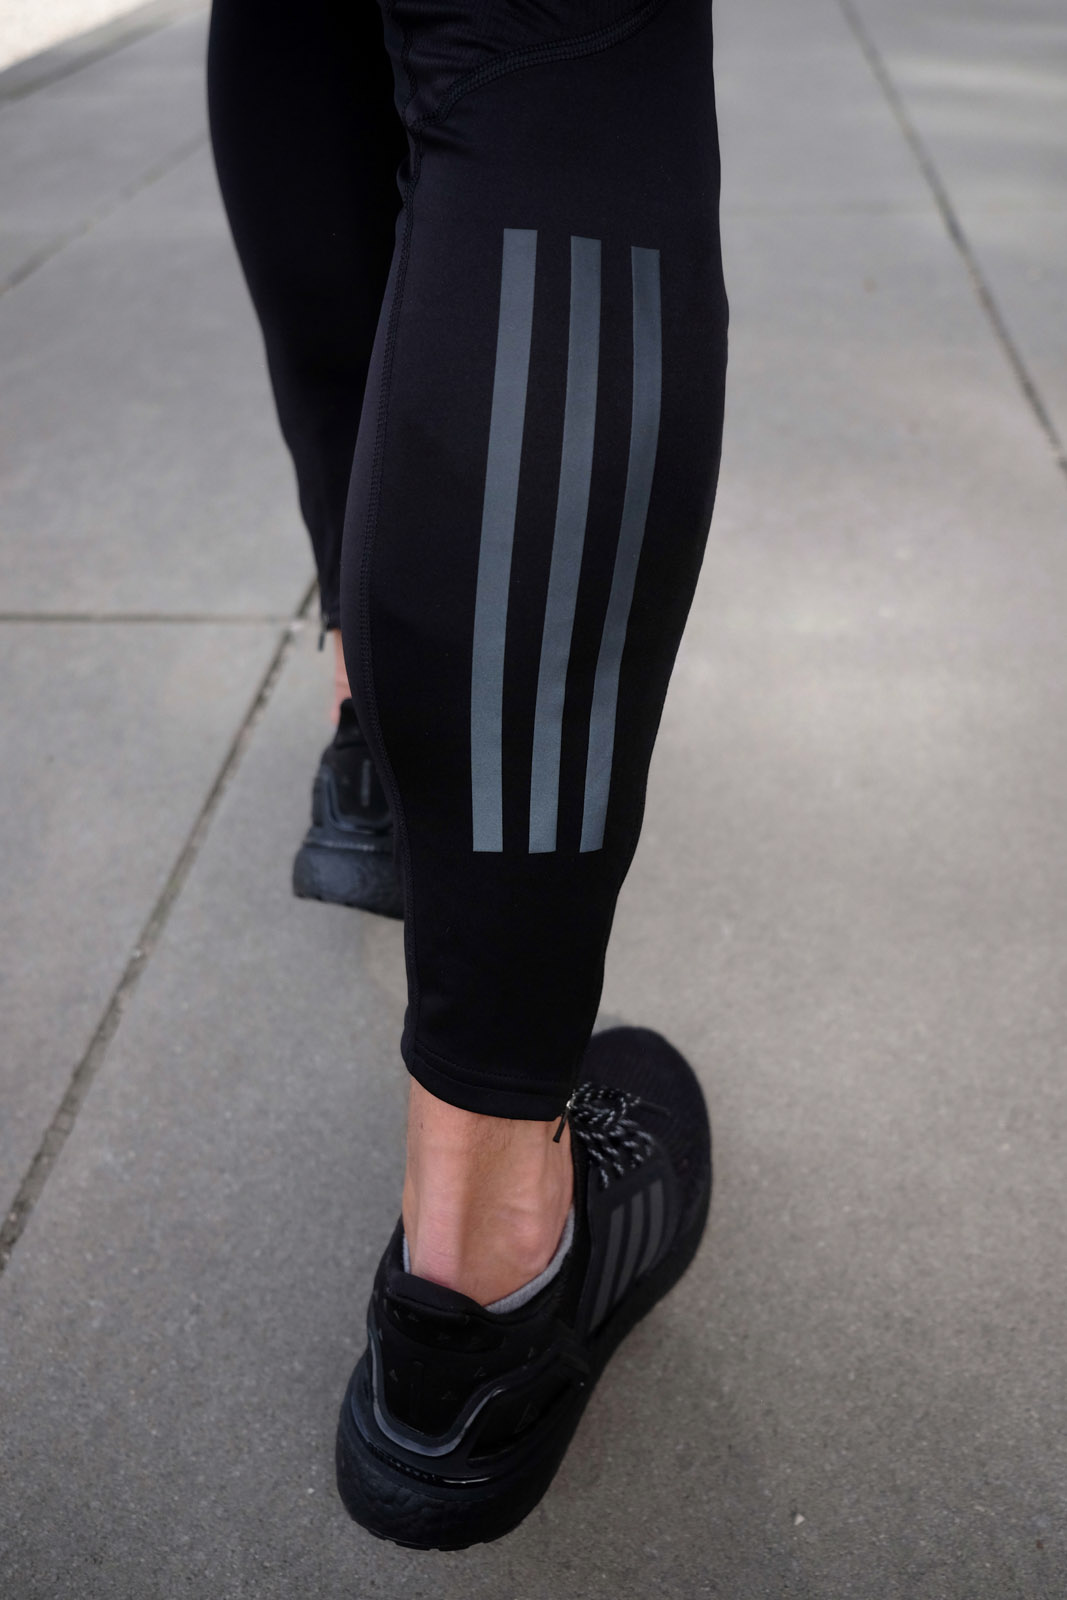 Own the run tight Adidas